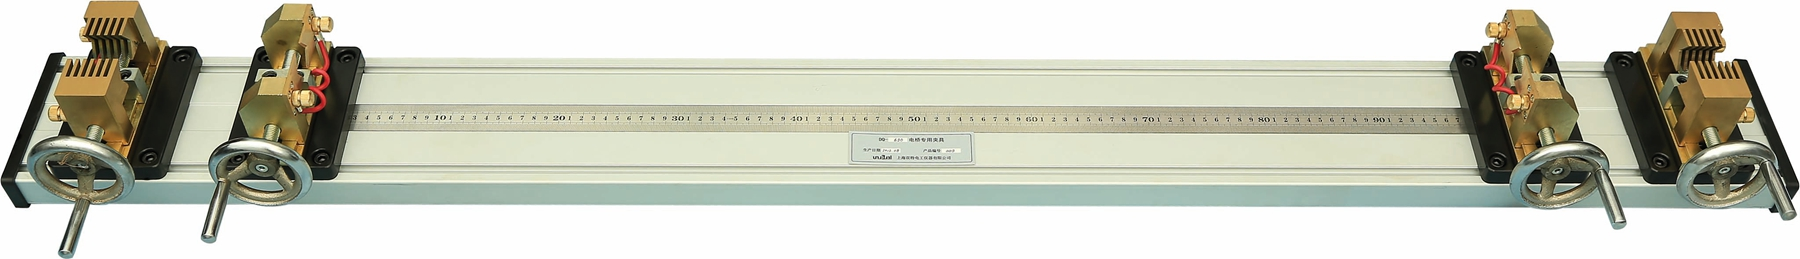 DQ-630型电桥专用夹具